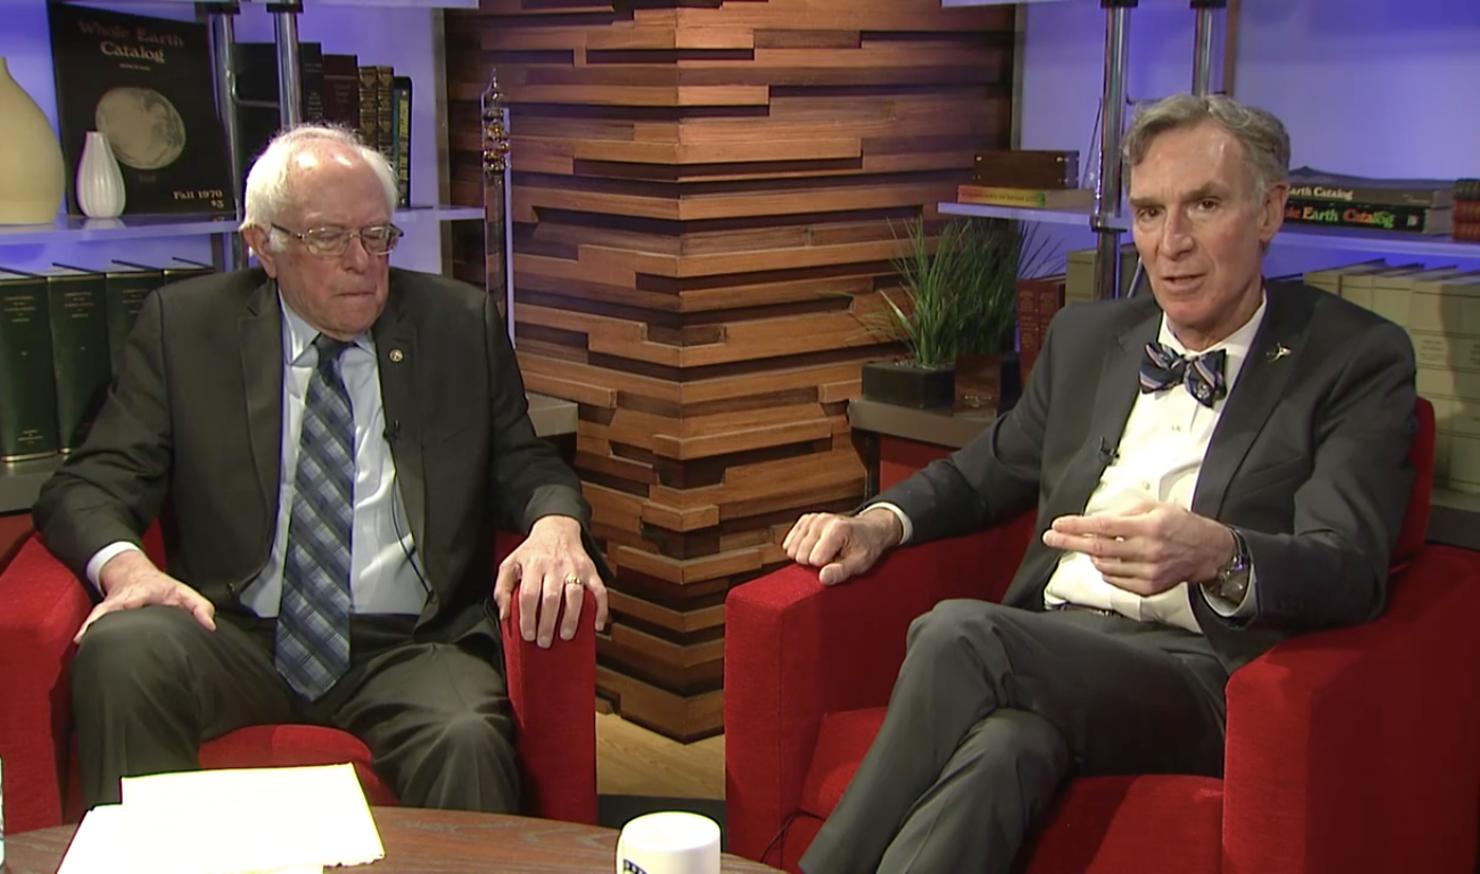 Bill Nye Amp Bernie Sanders Talk Climate Change